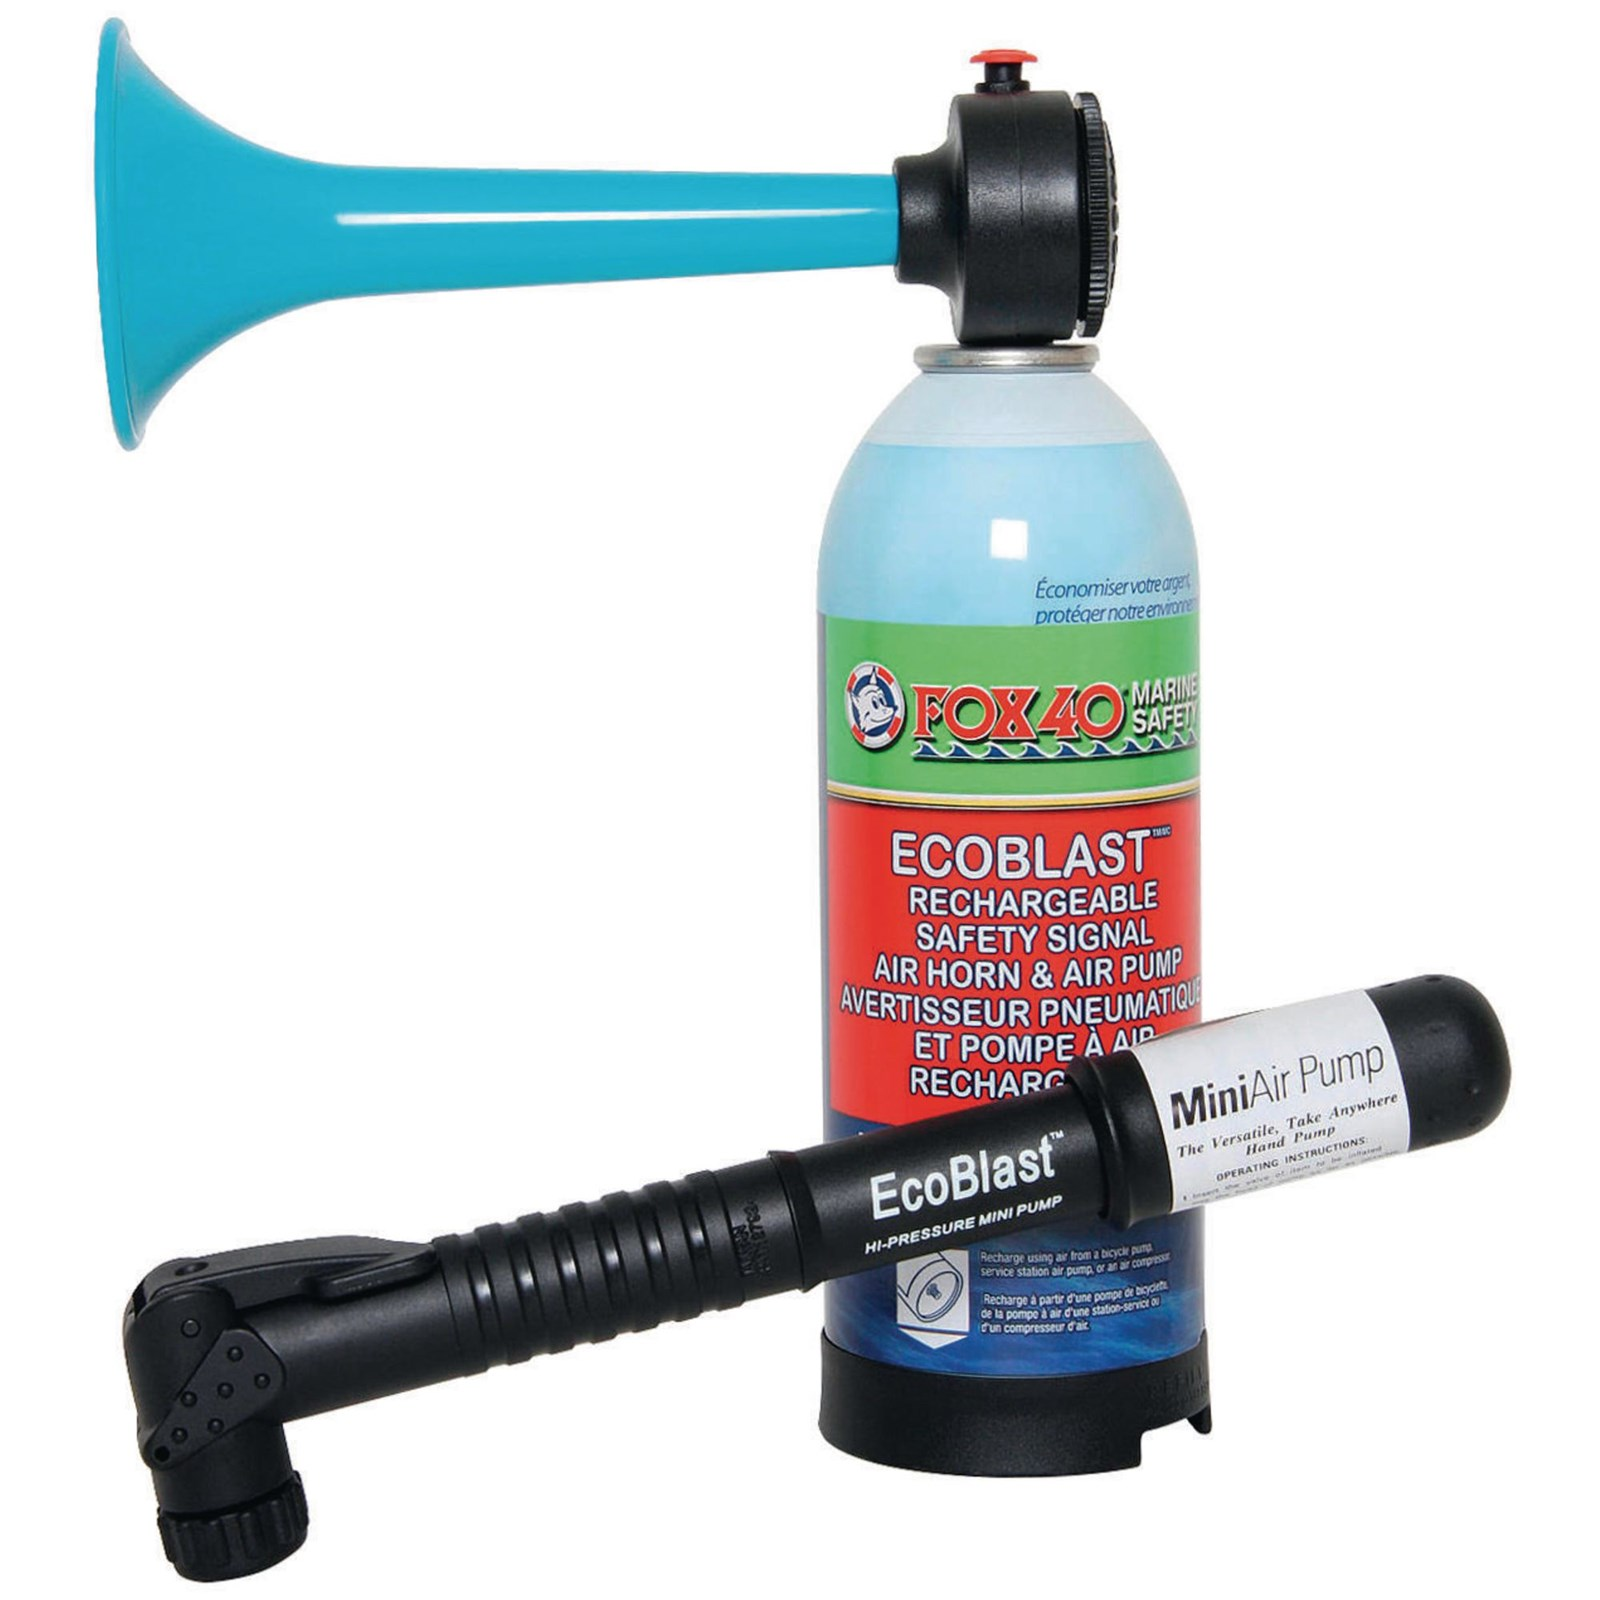 Fox 40® EcoBlast Air Horn and Pump